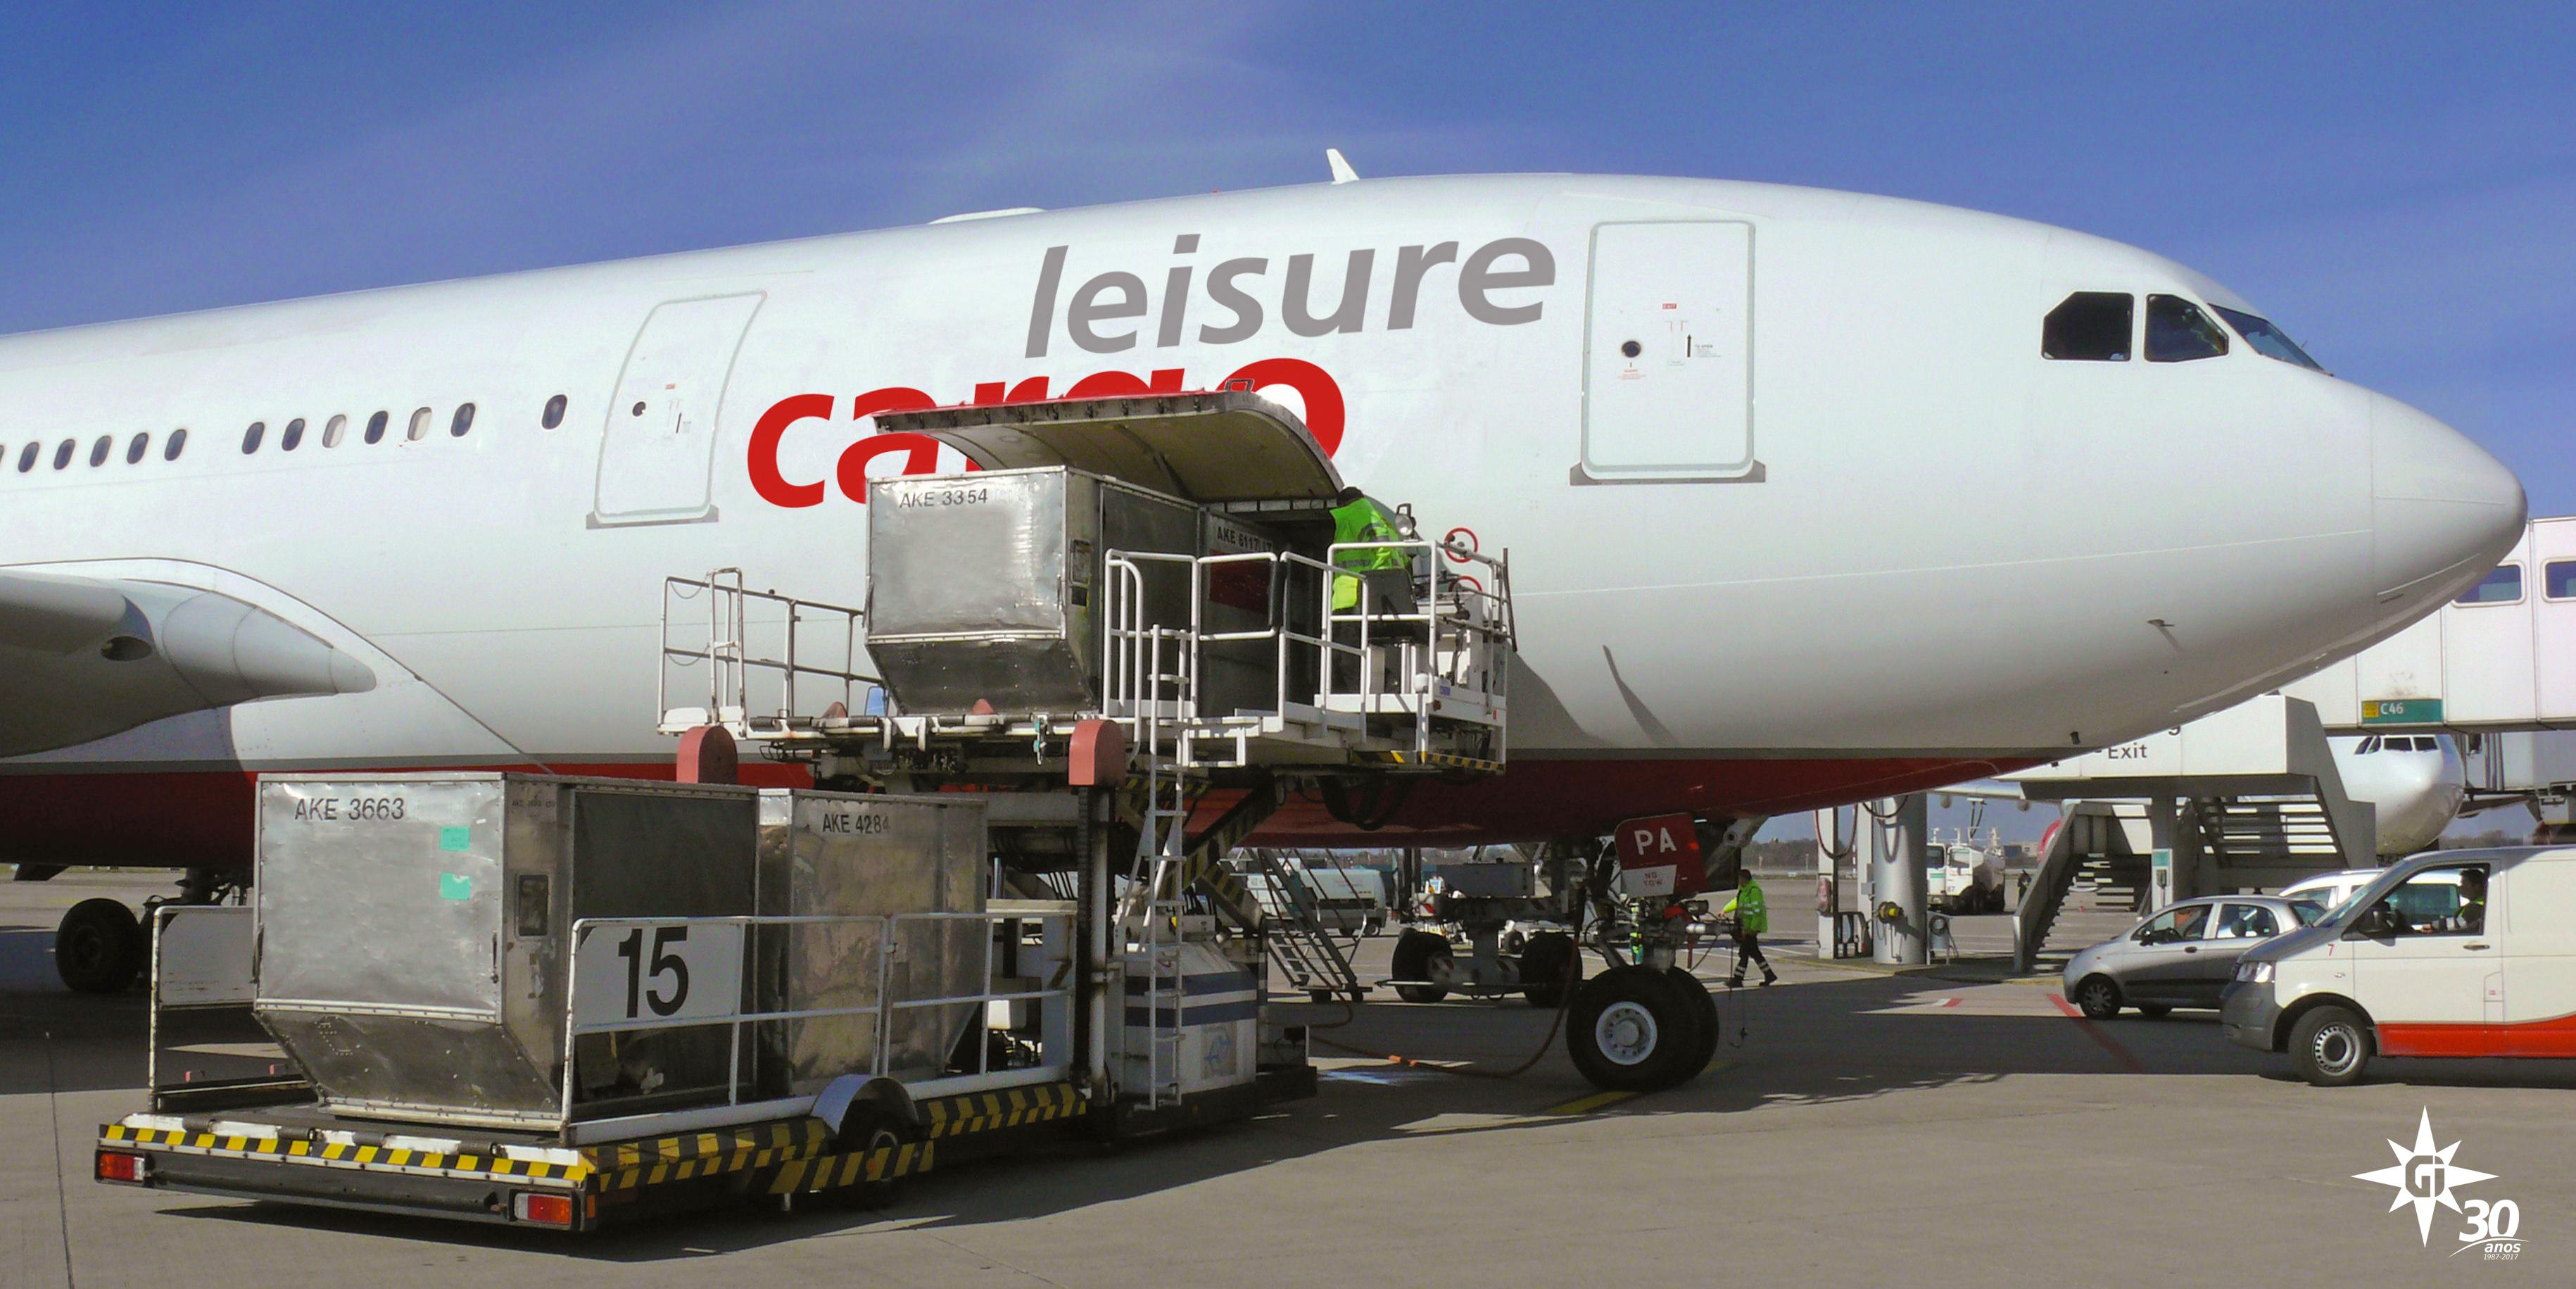 Leisure Cargo Plane